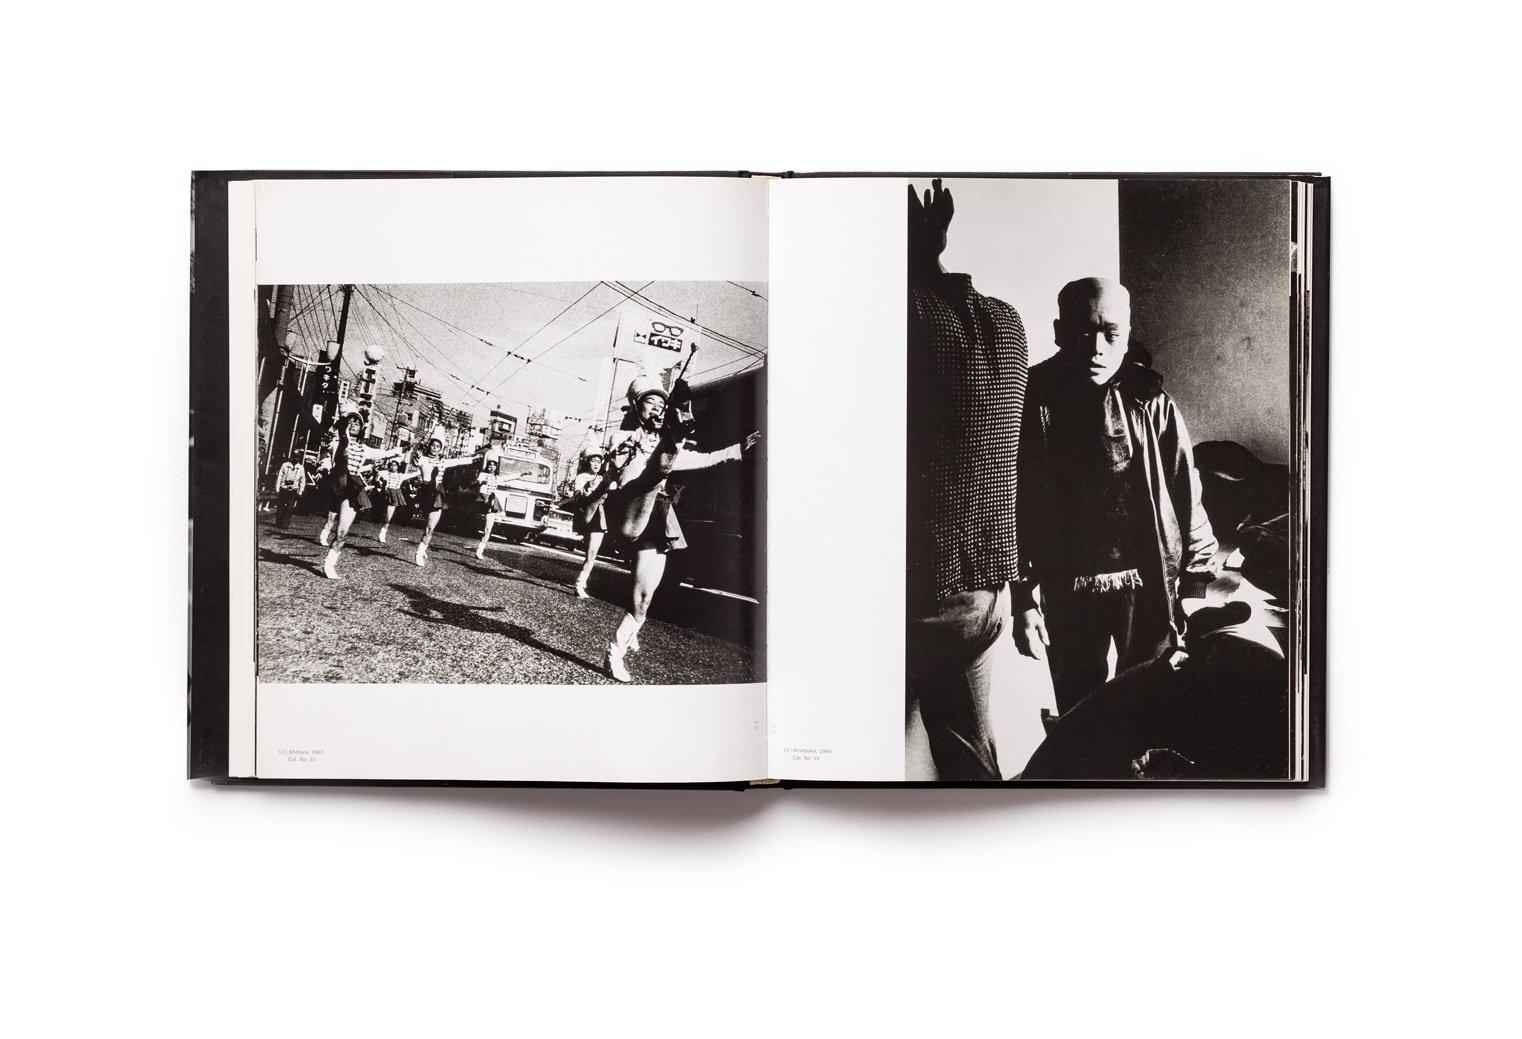 Daido Moriyama publication plates 13-14